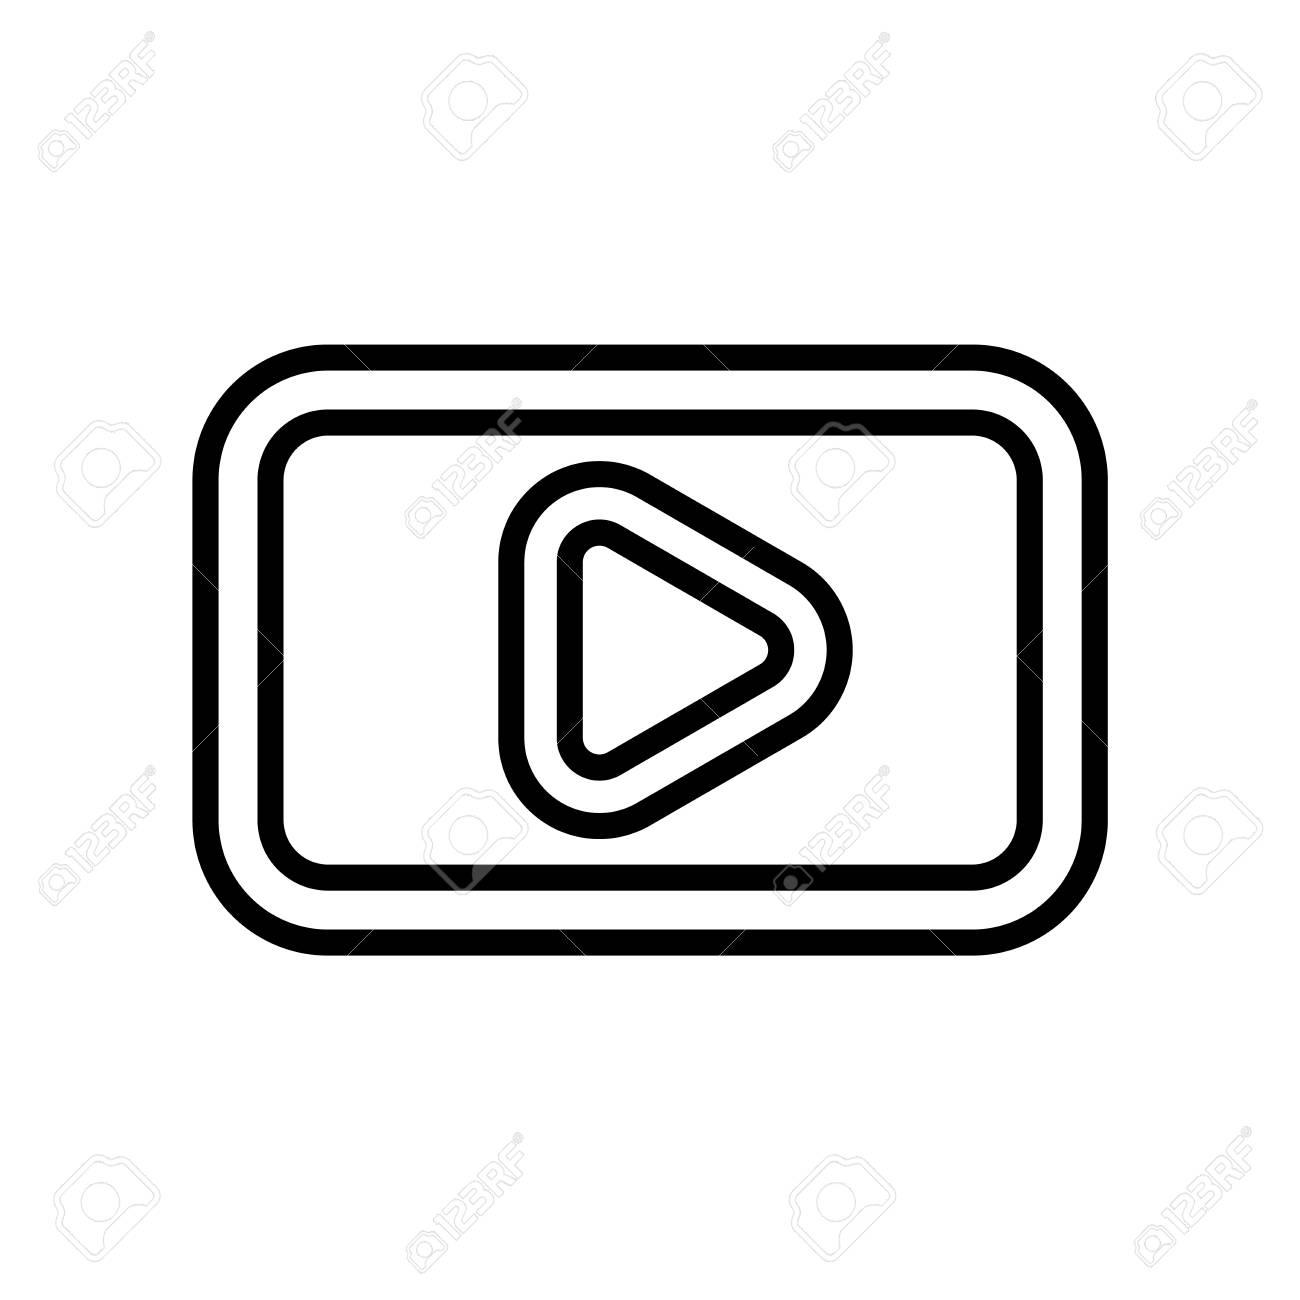 YouTube Logo Square icon vector isolated on white background